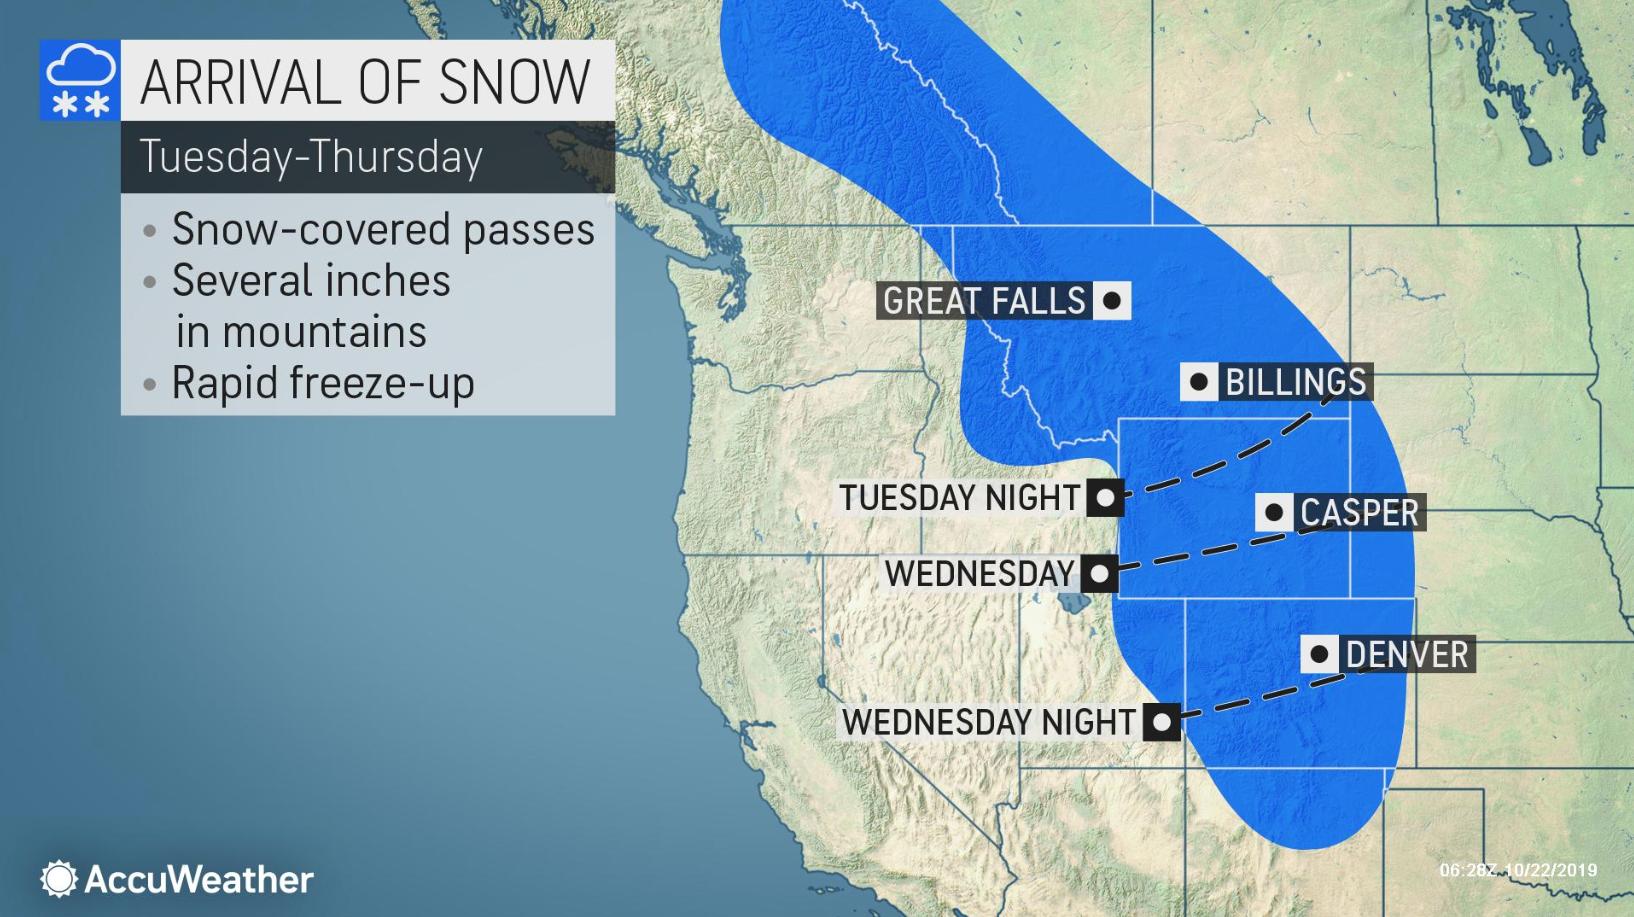 Quick-hitting snow to strike Denver, Front Range of Rockies this week